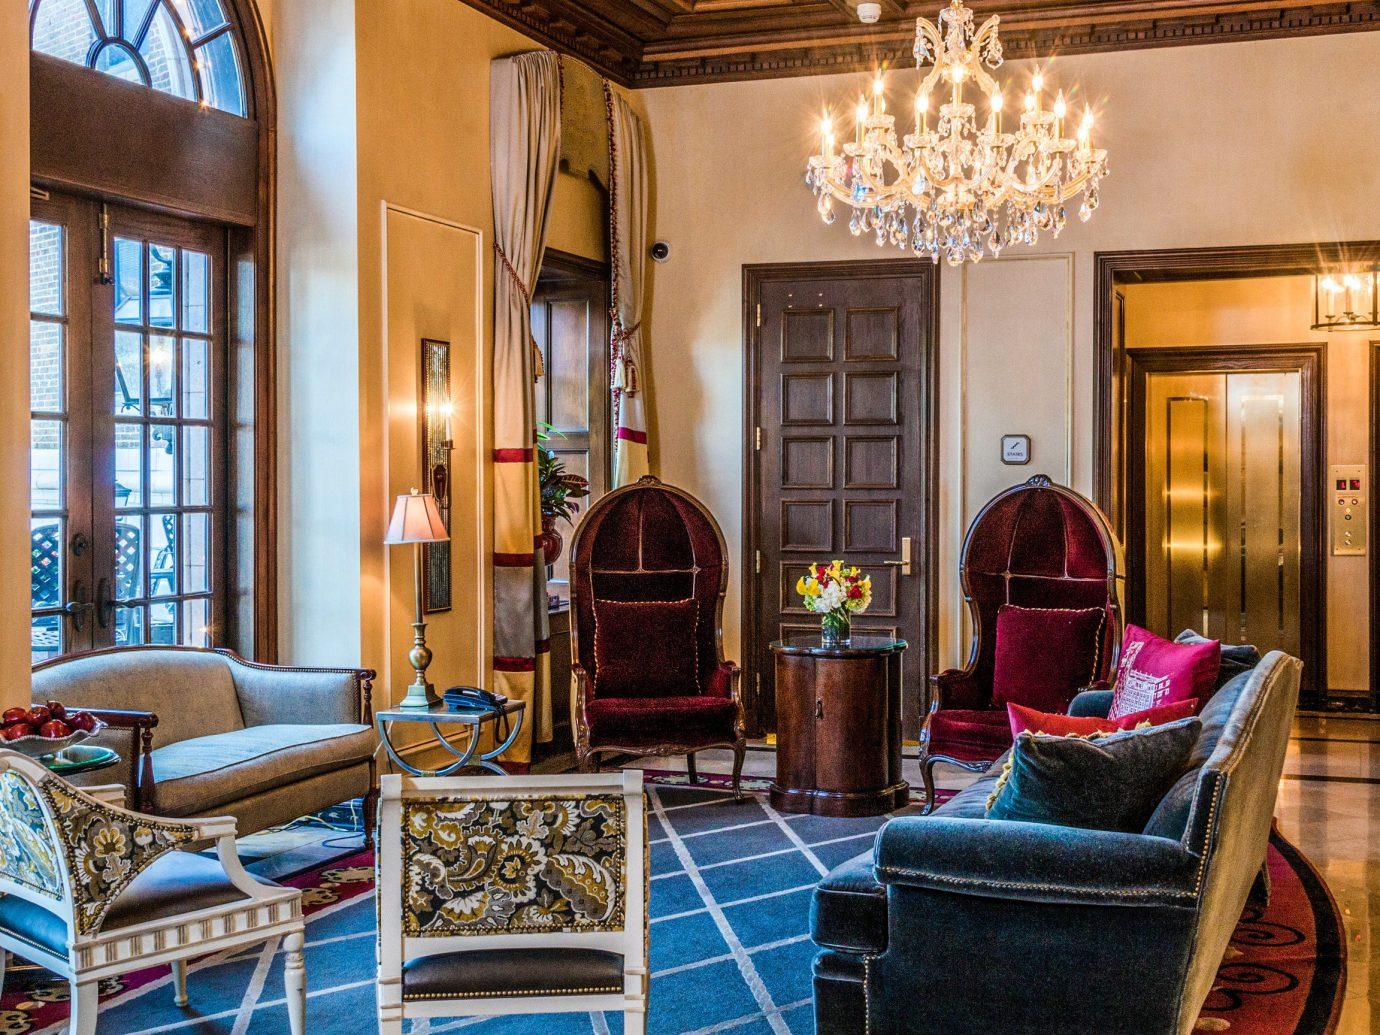 City Kansas City Midwest Trip Ideas indoor floor room window living room Living interior design Lobby estate real estate home Suite ceiling furniture